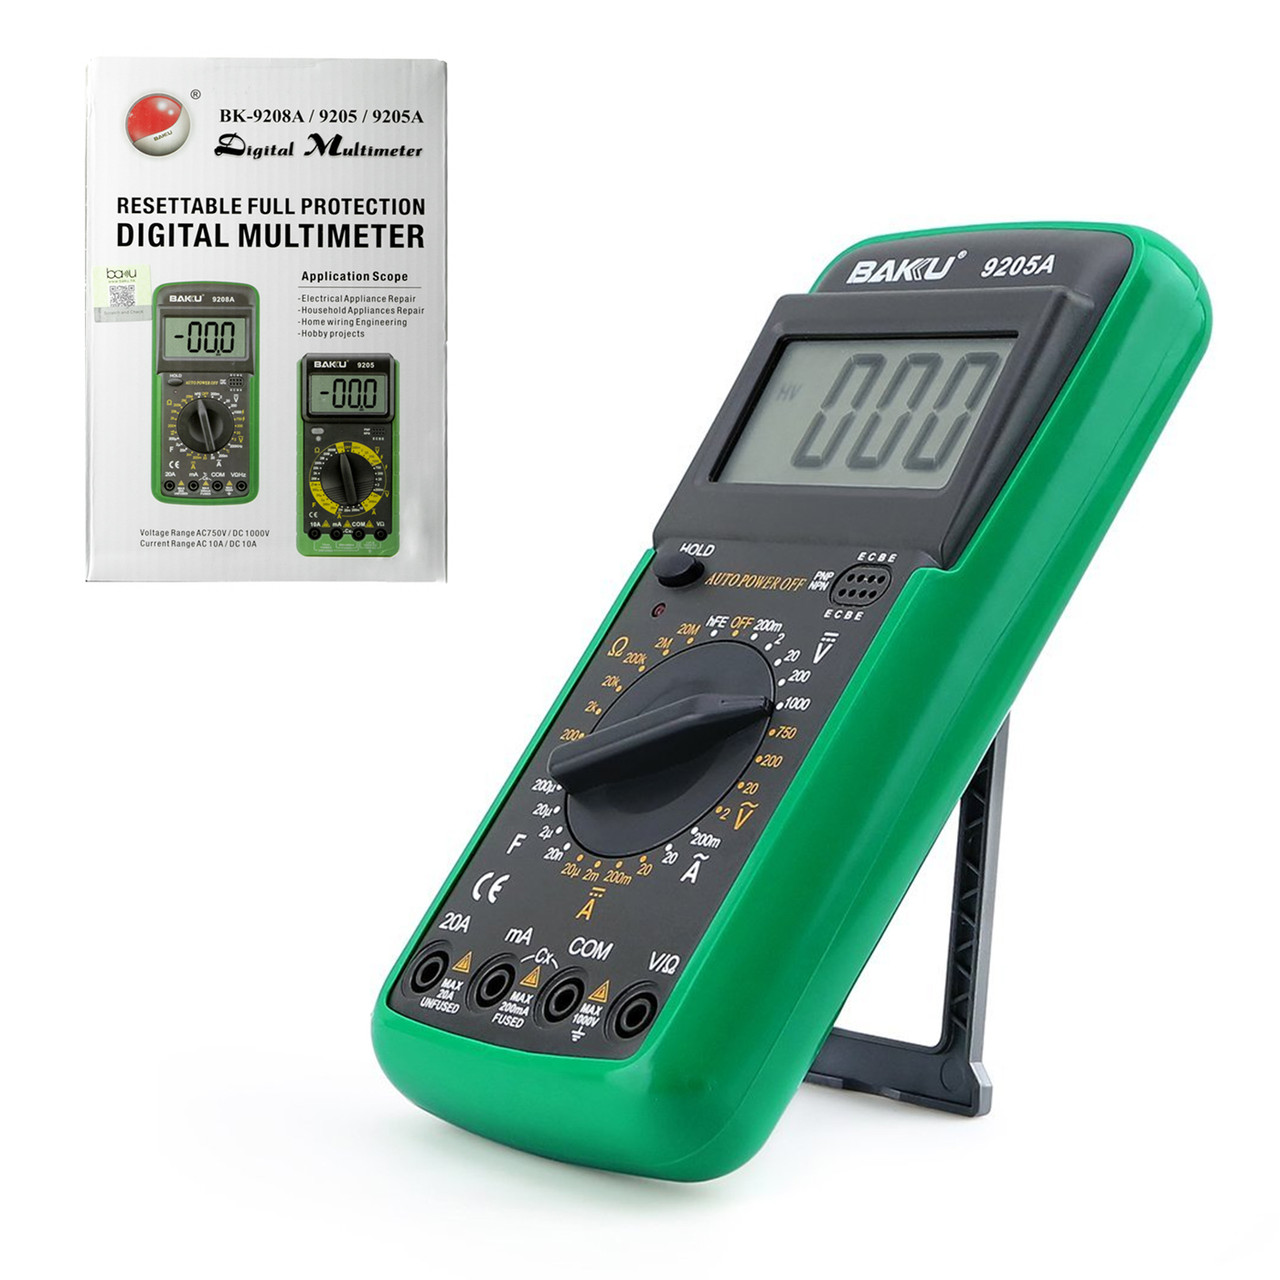 Мультиметр цифровой Baku BK-9205A с функцией автоотключения (ток до 20А) Green/Gray